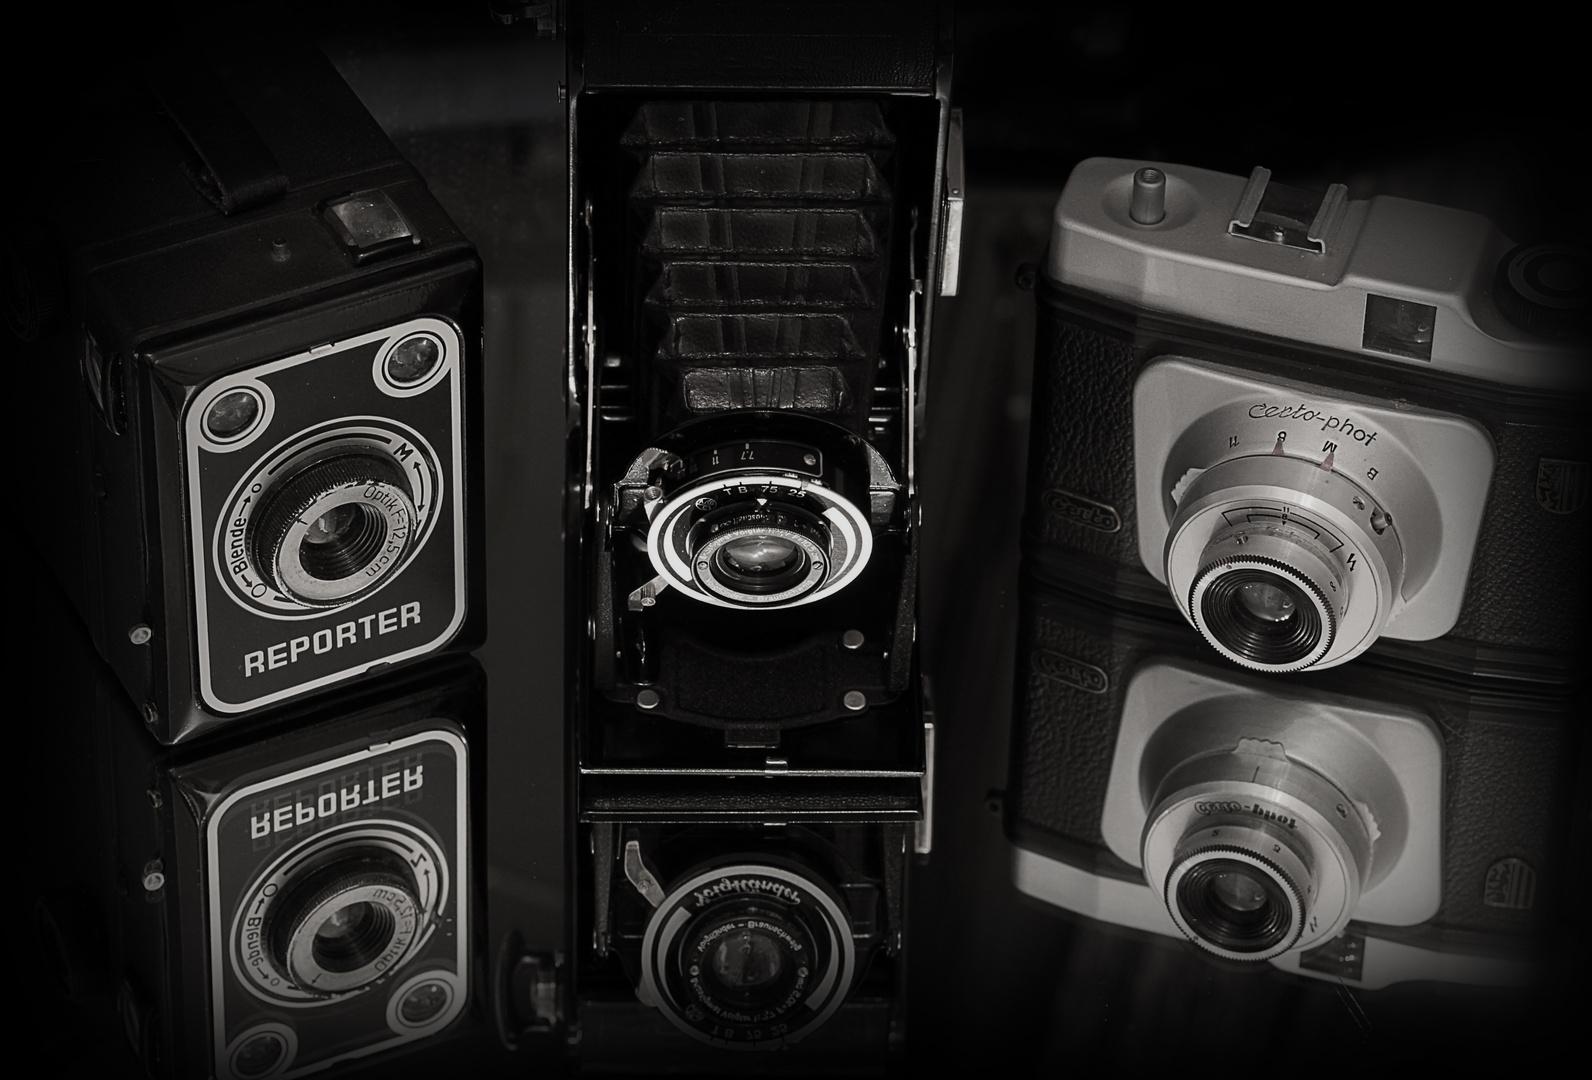 Good old Cameras